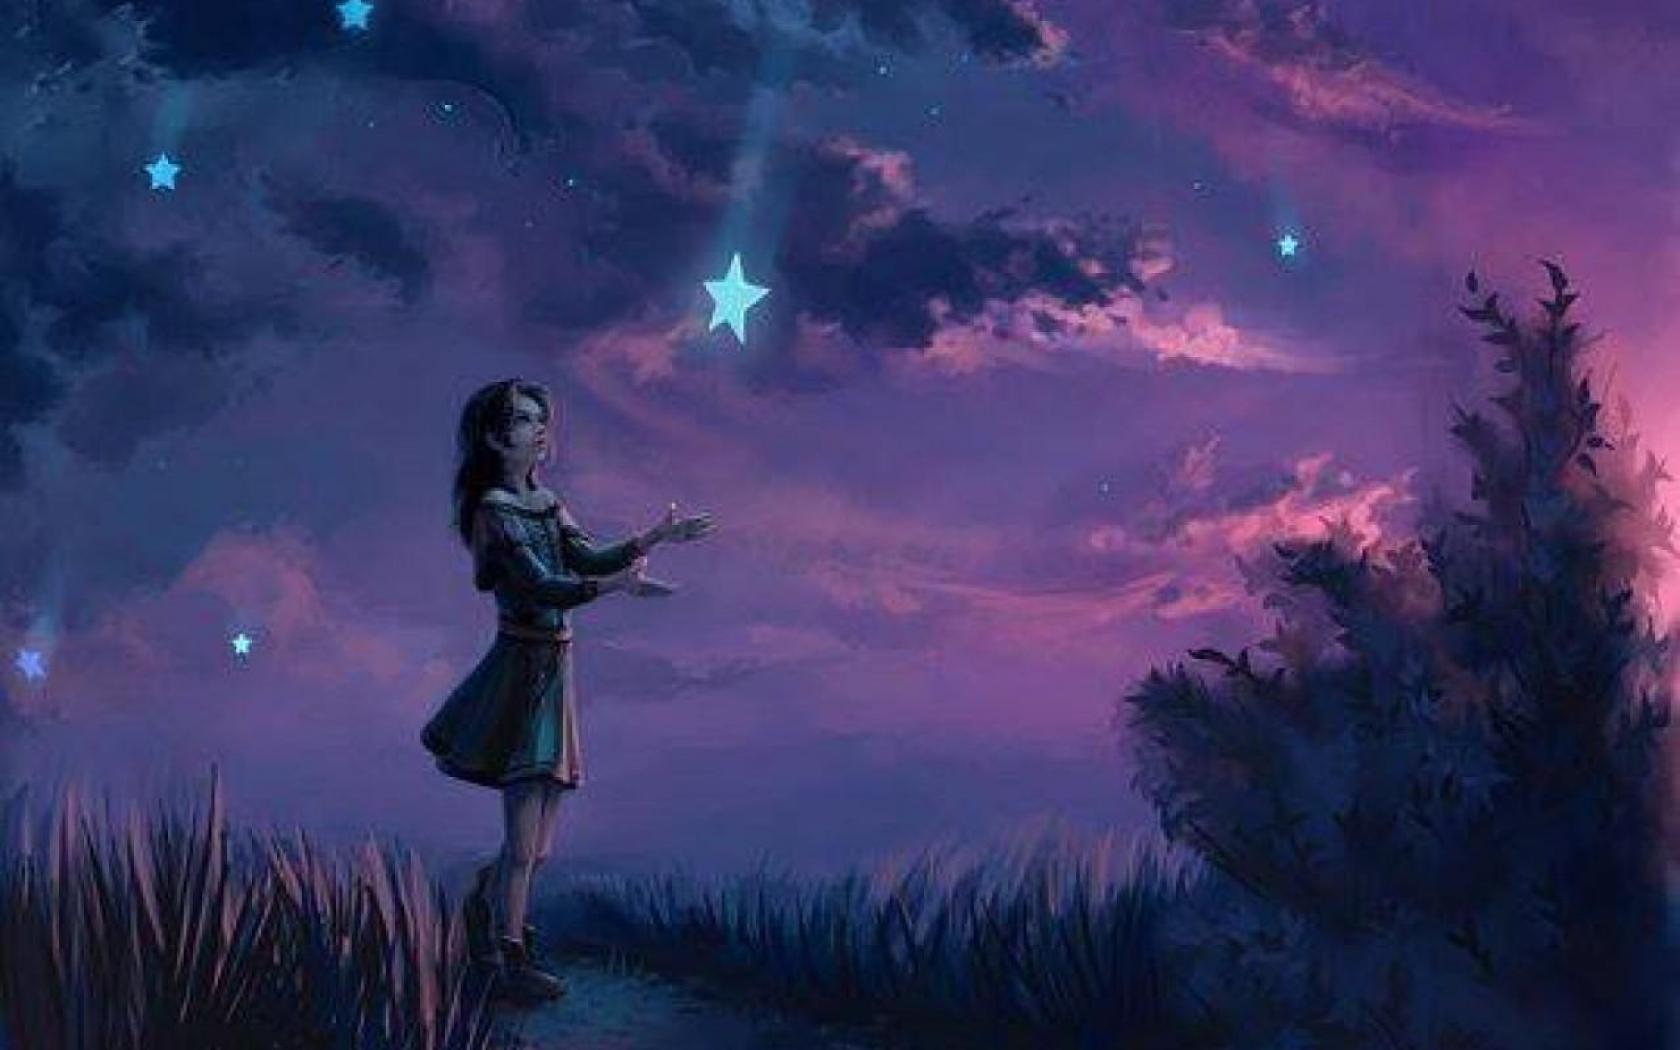 shooting stars 1680x1050px 111 21 kb shooting stars 800x649px 201 78 1680x1050